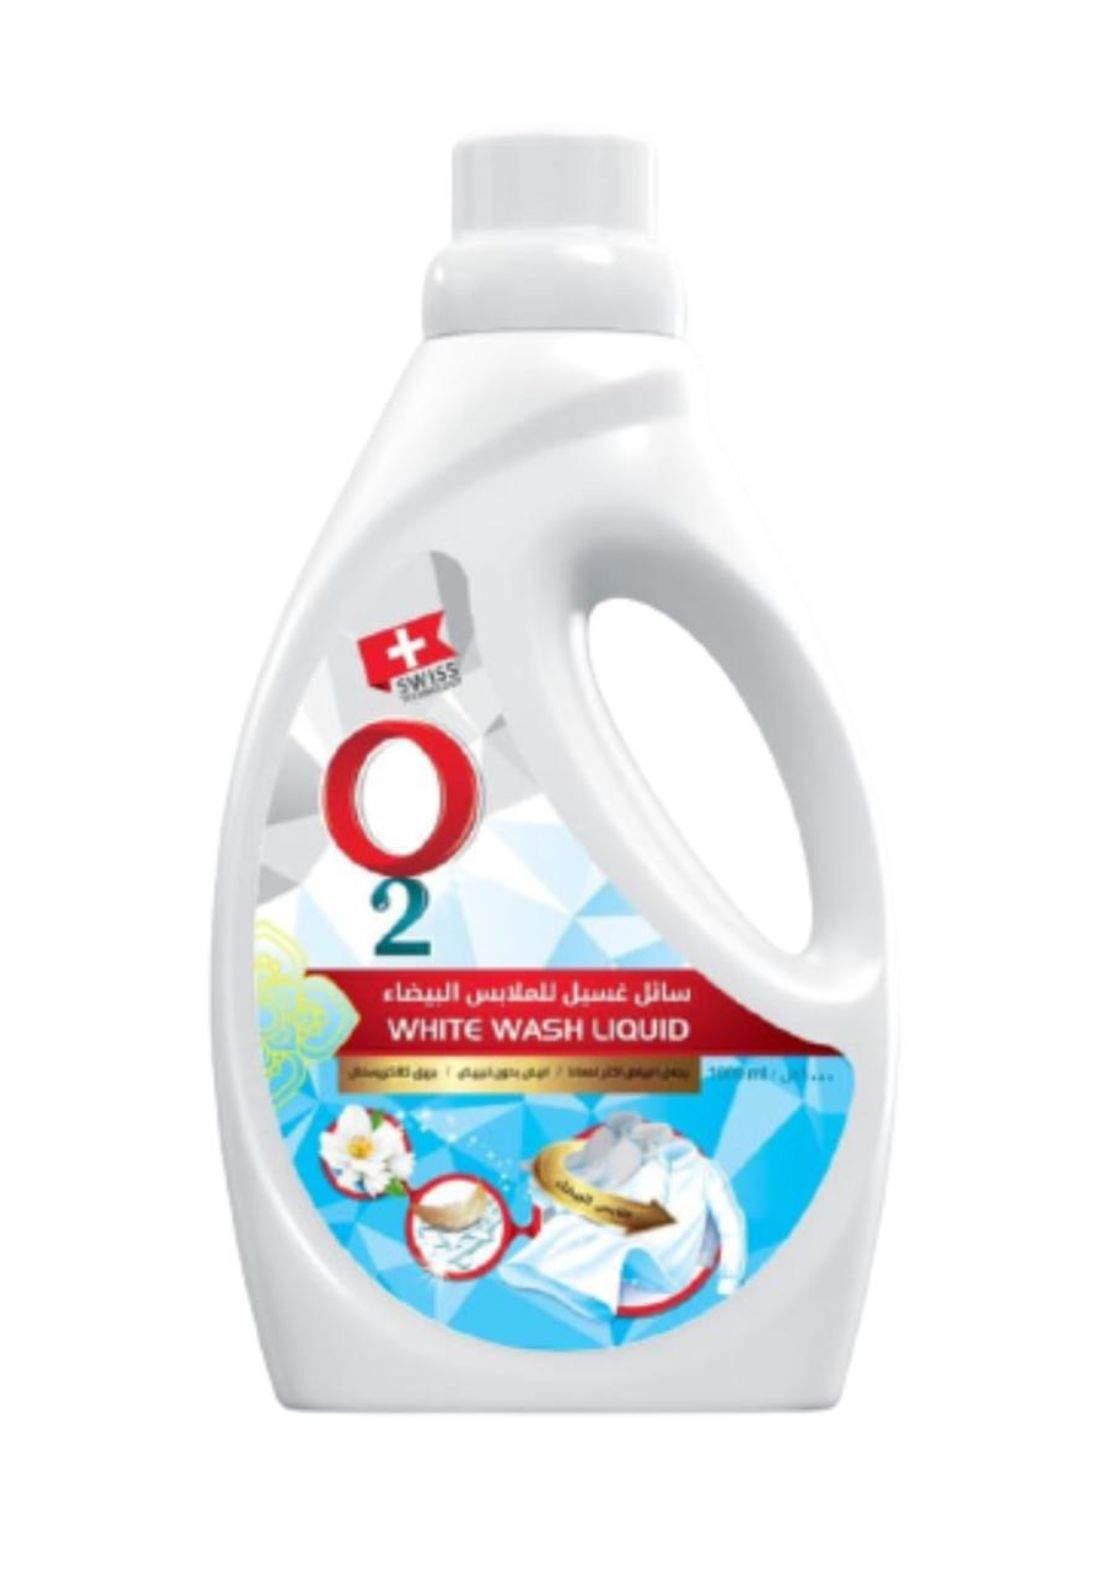 O2 white wash liquid 1000mL اوتو سائل غسيل الملابس البيضاء